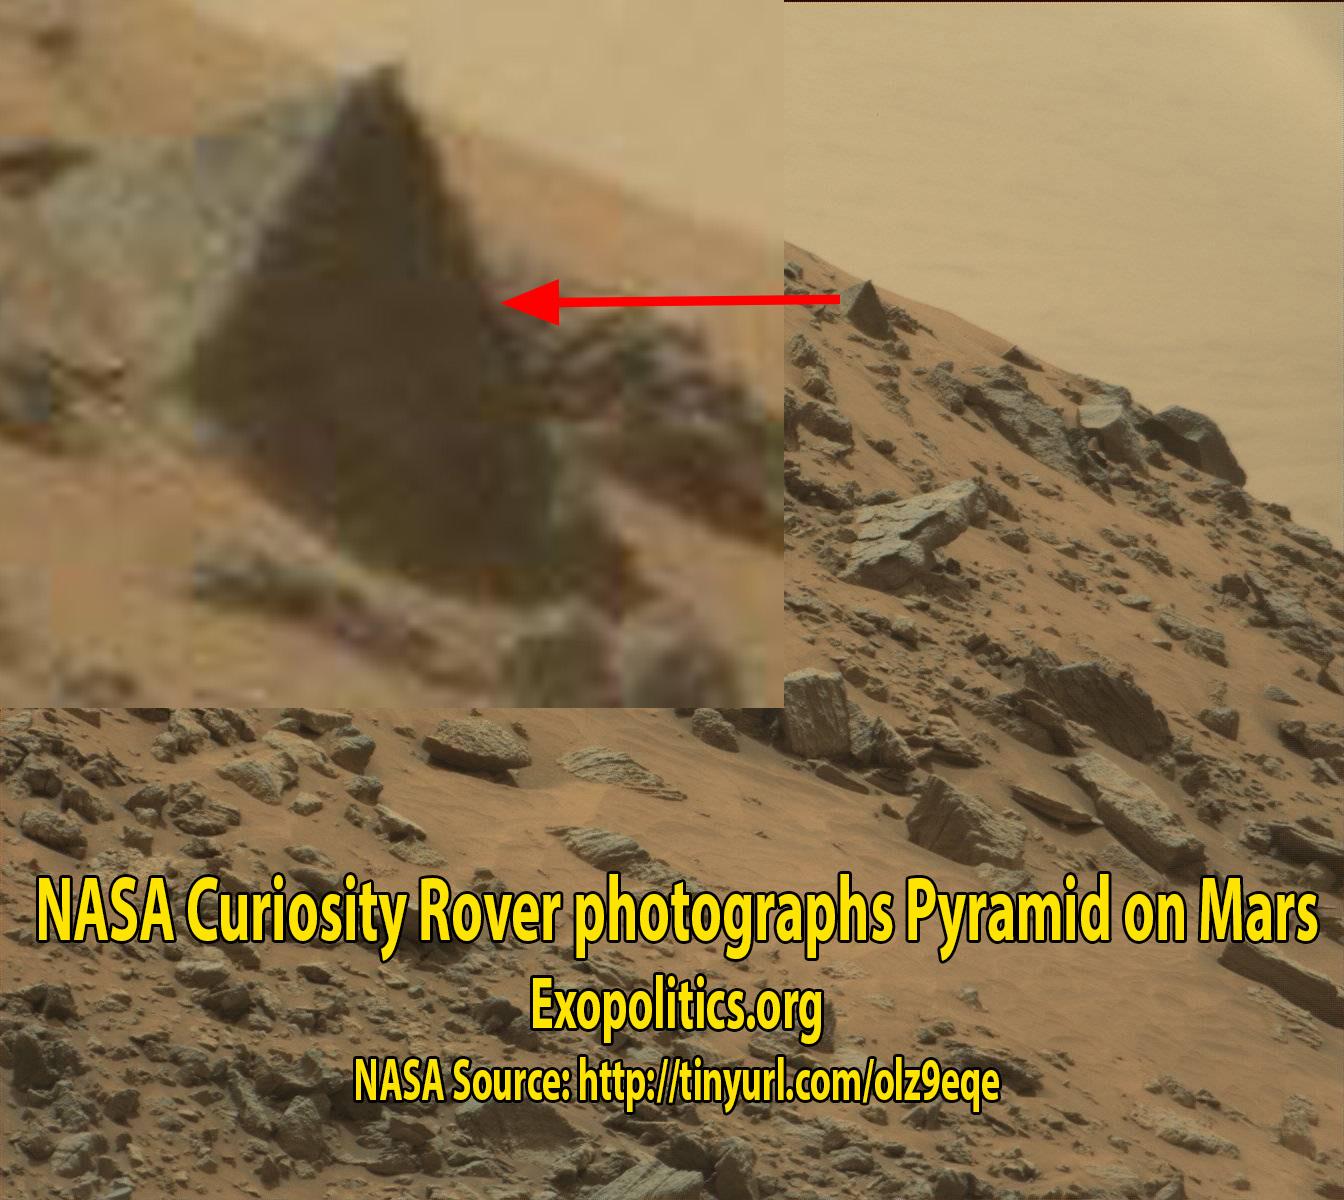 NASA Curiosity Rover photographs pyramid on Mars » Exopolitics